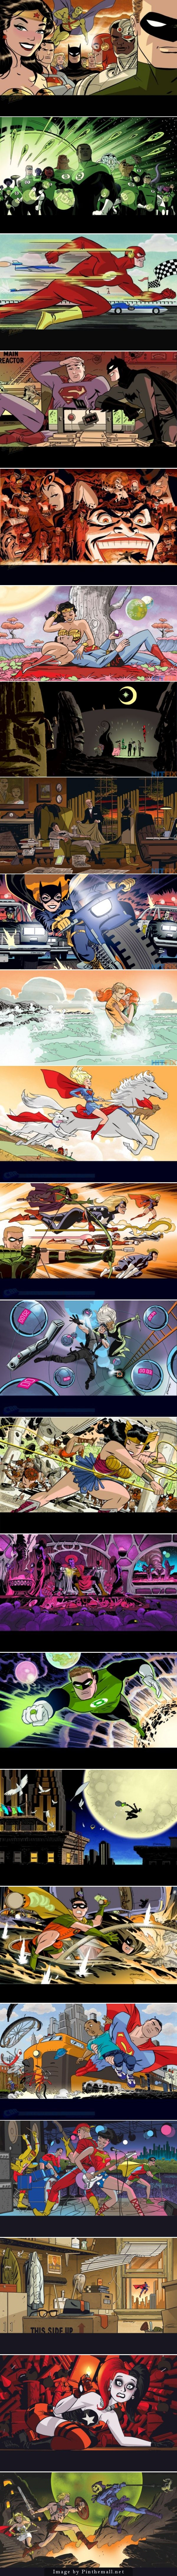 Darwyn Cooke faz as capas variantes dos gibis da DC de dezembro!... - a grouped images picture - Pin Them All